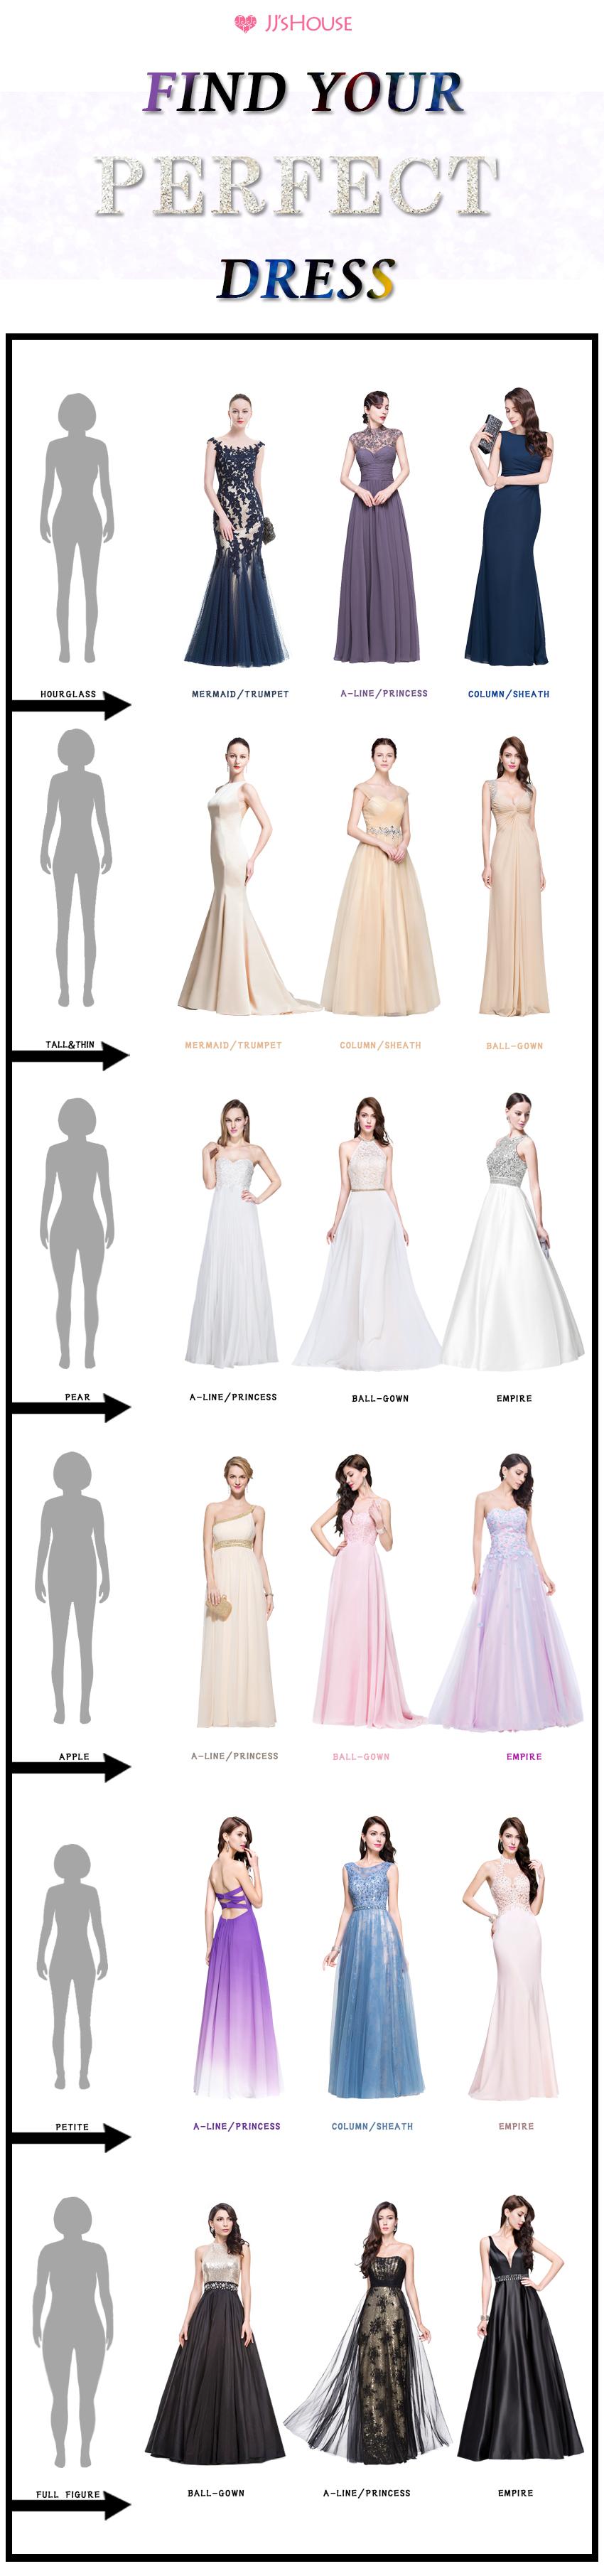 Special Occasion Dresses Elegant Formal Dresses Dresses Formal Elegant Perfect Dress Pretty Dresses